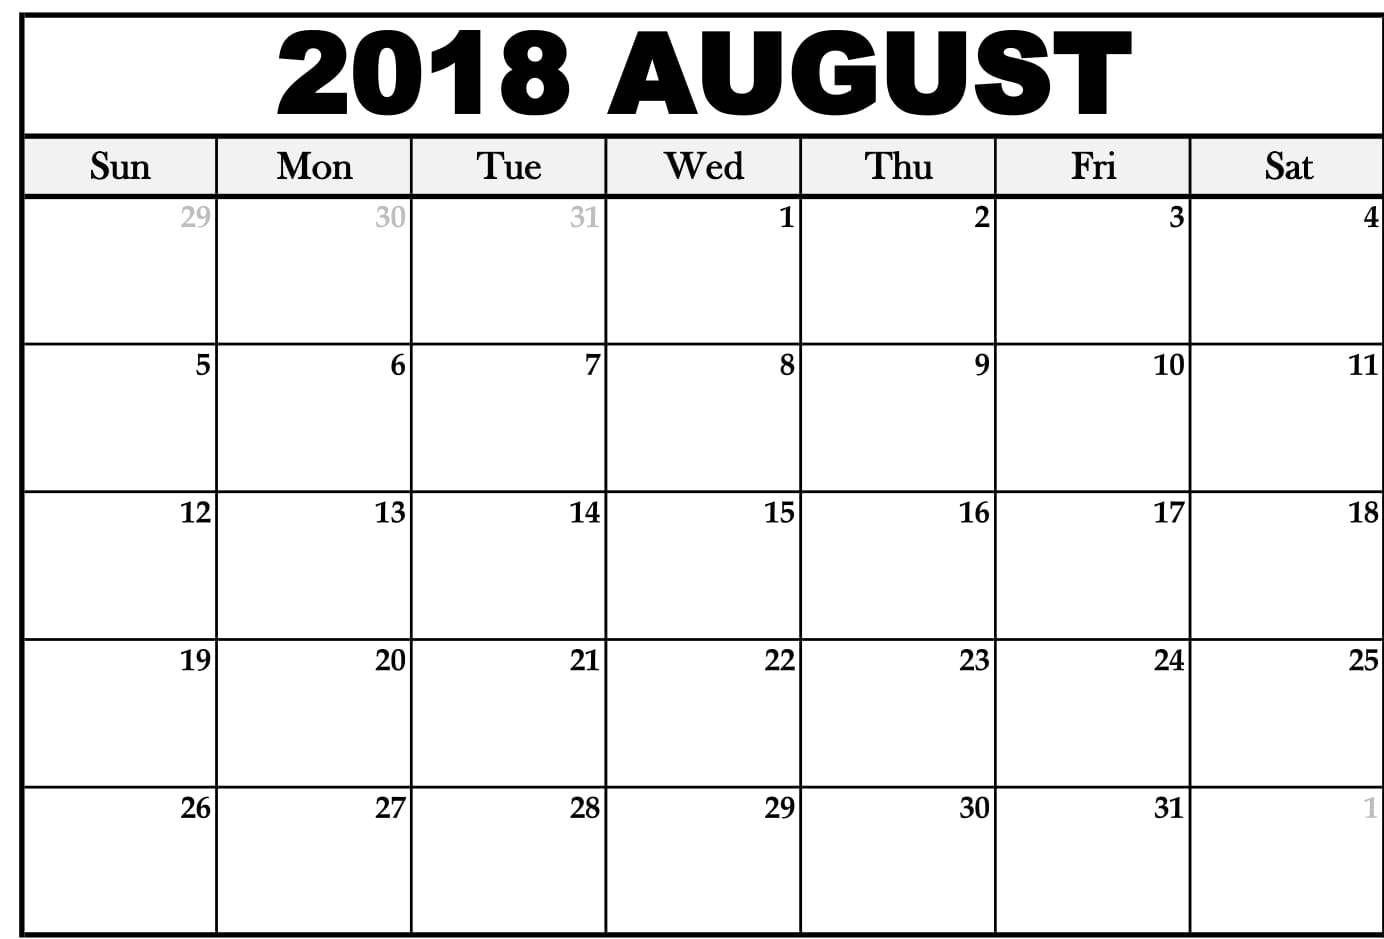 August 2018 Calendar Page Word Excel Pdf Printable Template